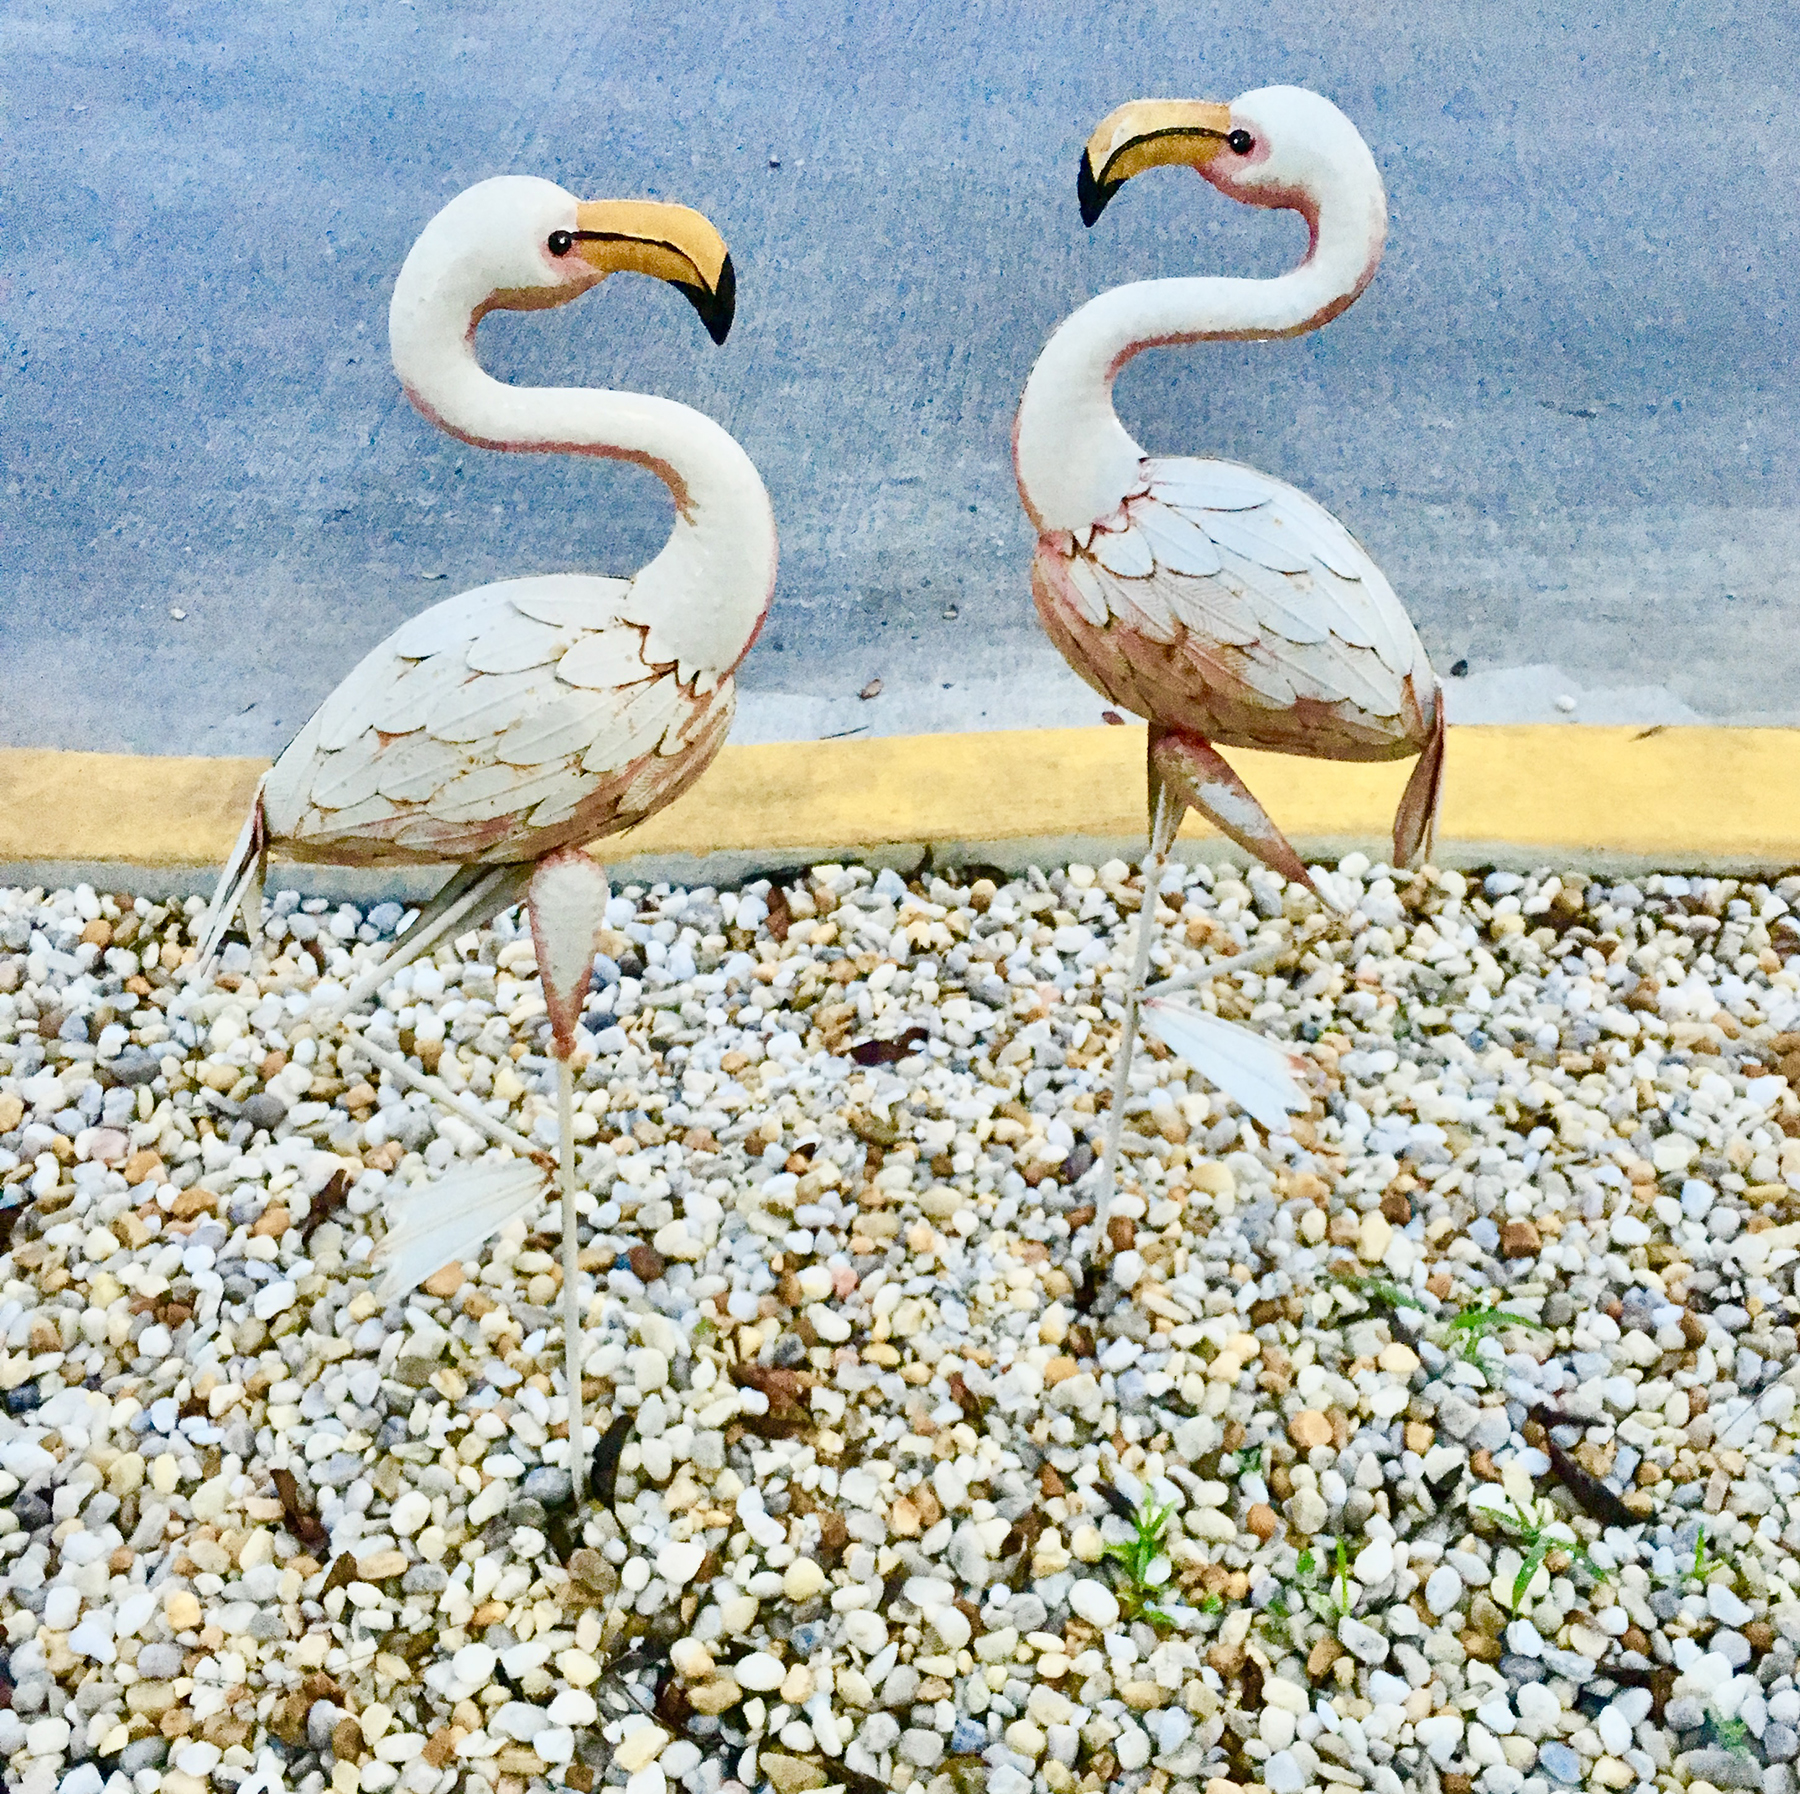 Carwash-flamingo-standoff_Wesley-Chapel